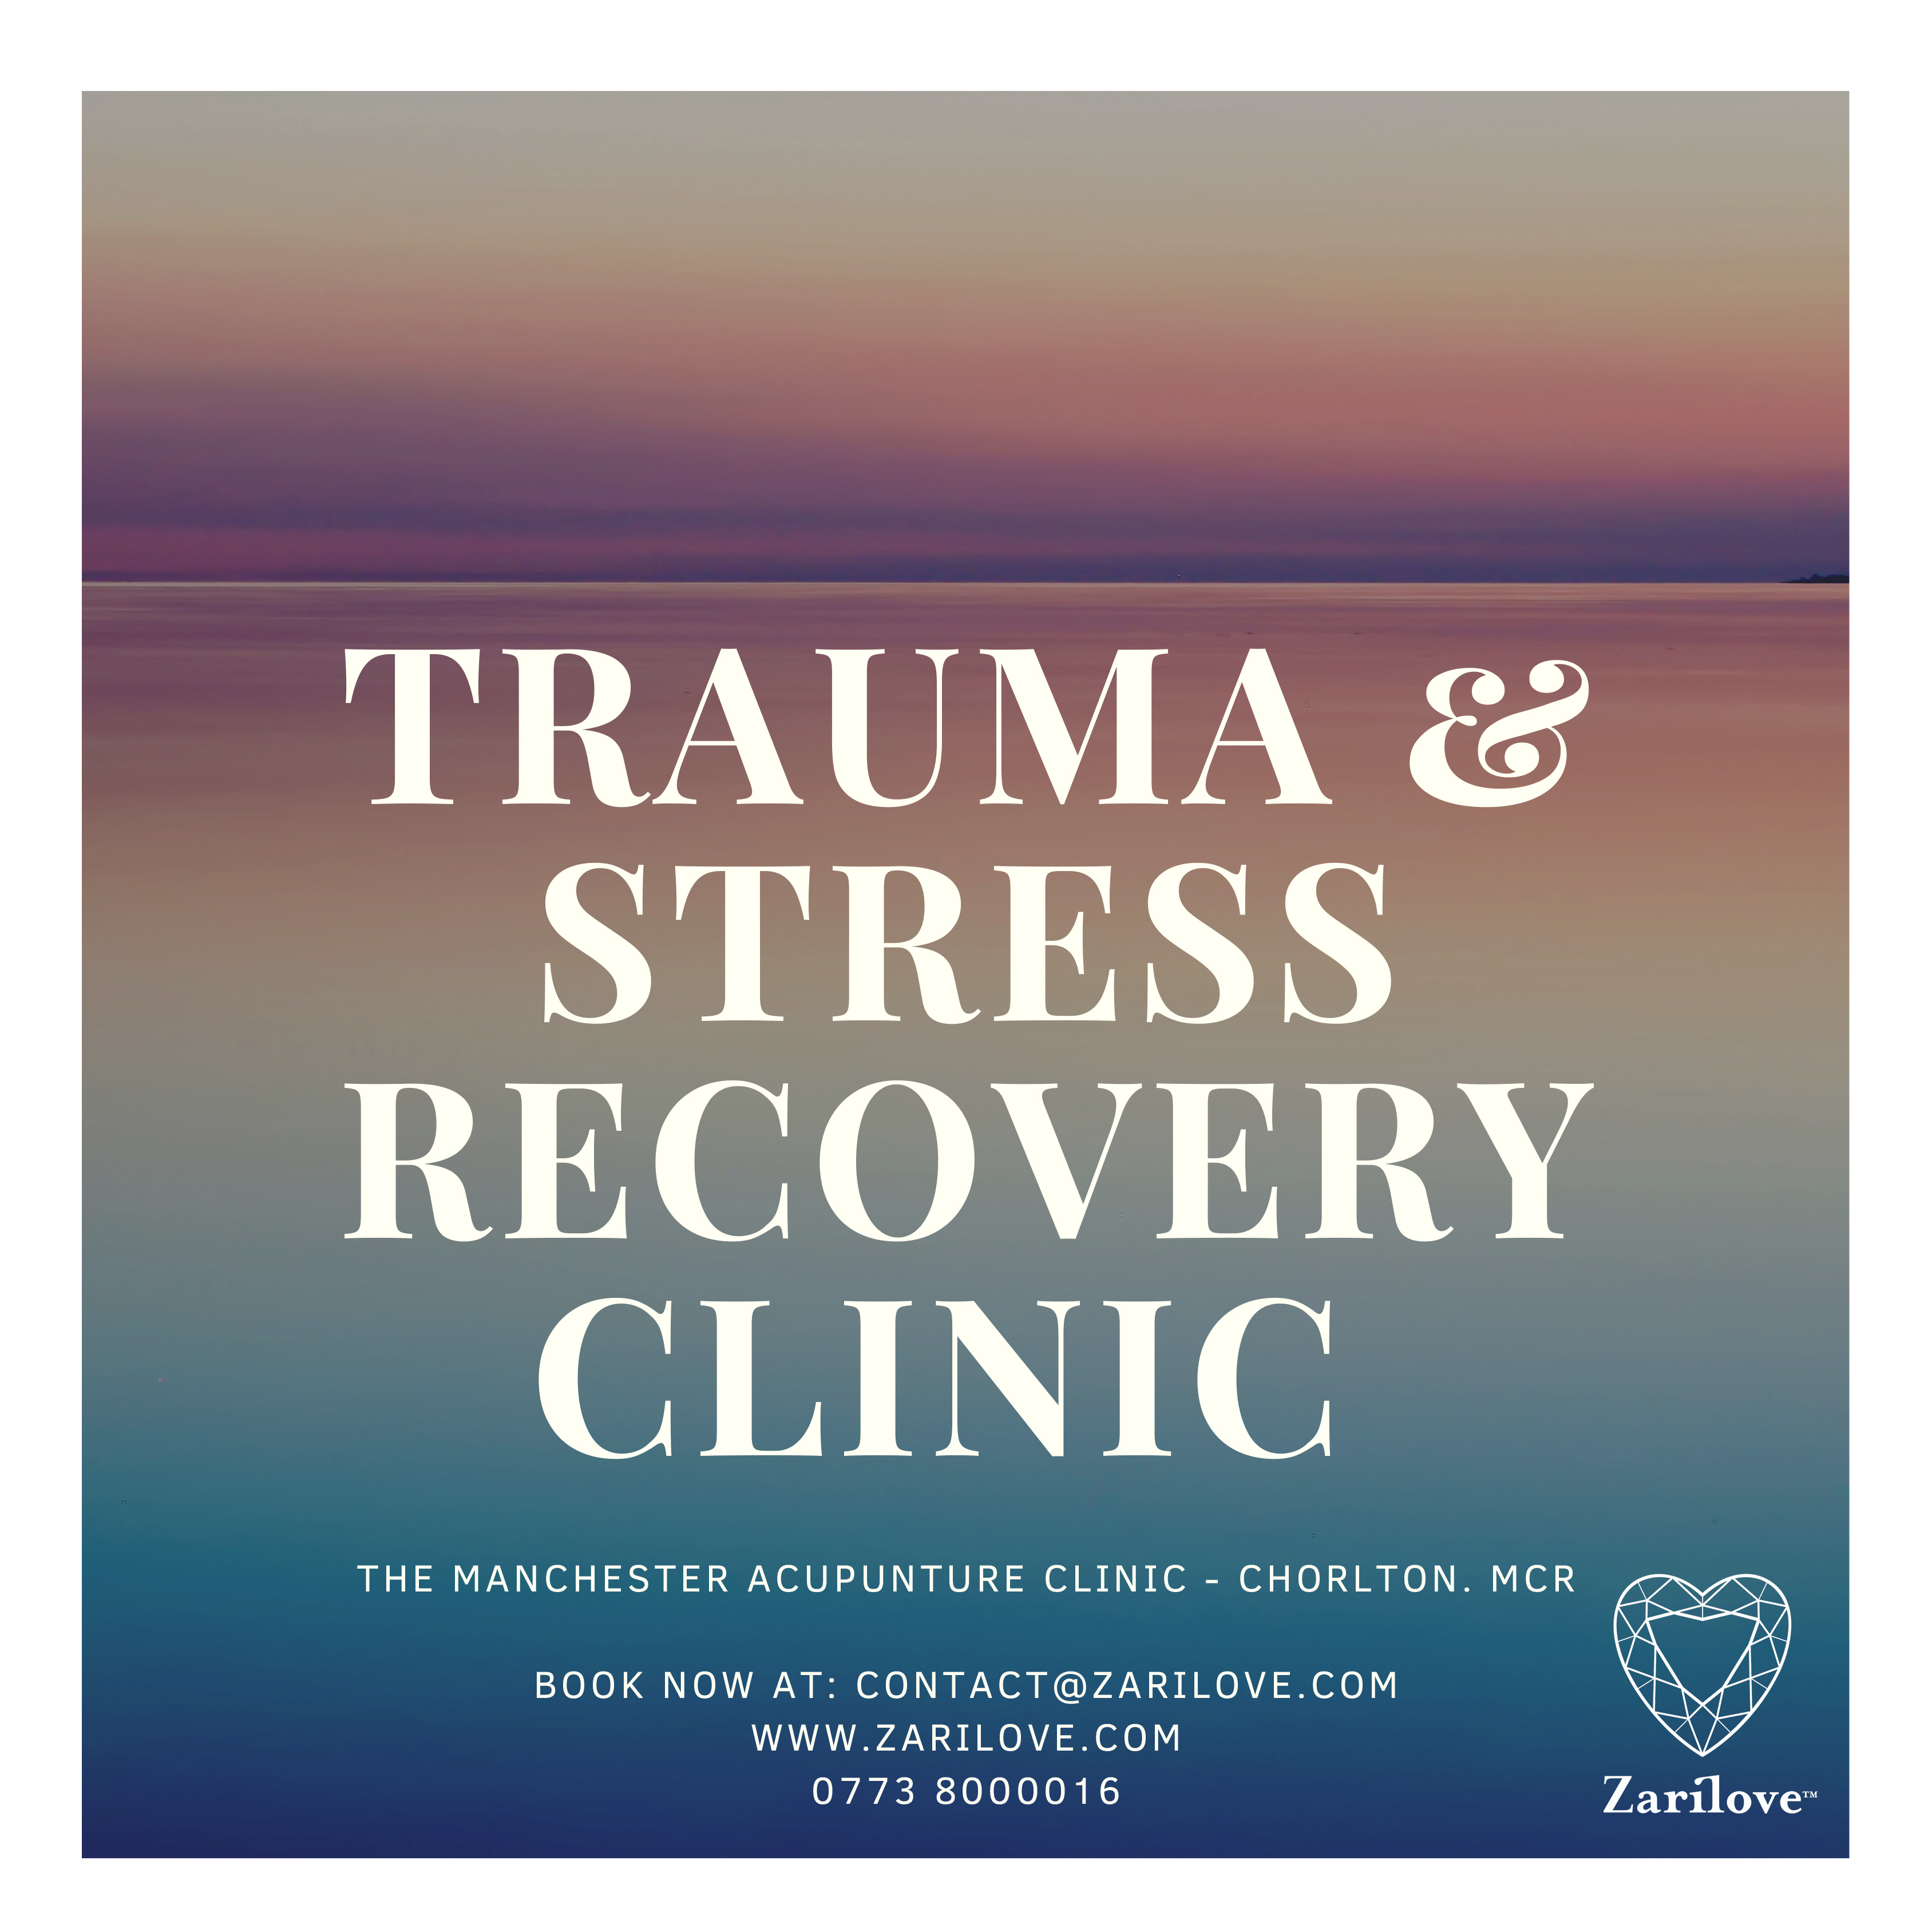 Trauma Recovery Clinic